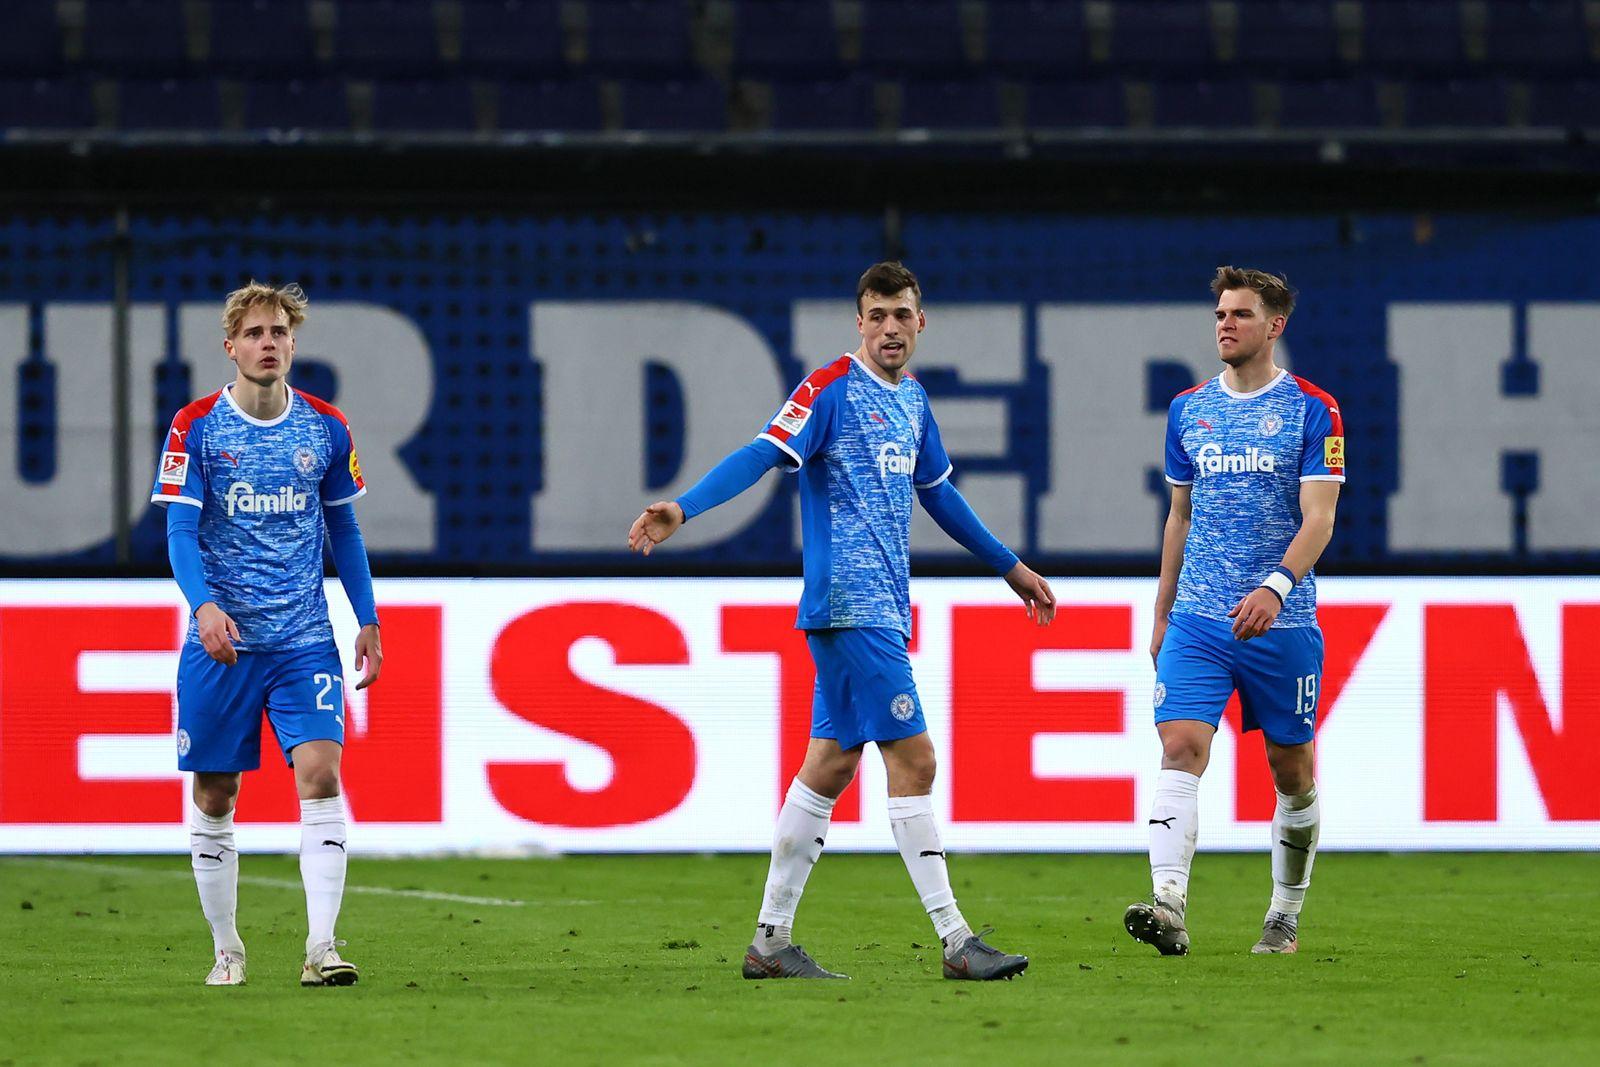 Hamburger SV v Holstein Kiel - Second Bundesliga